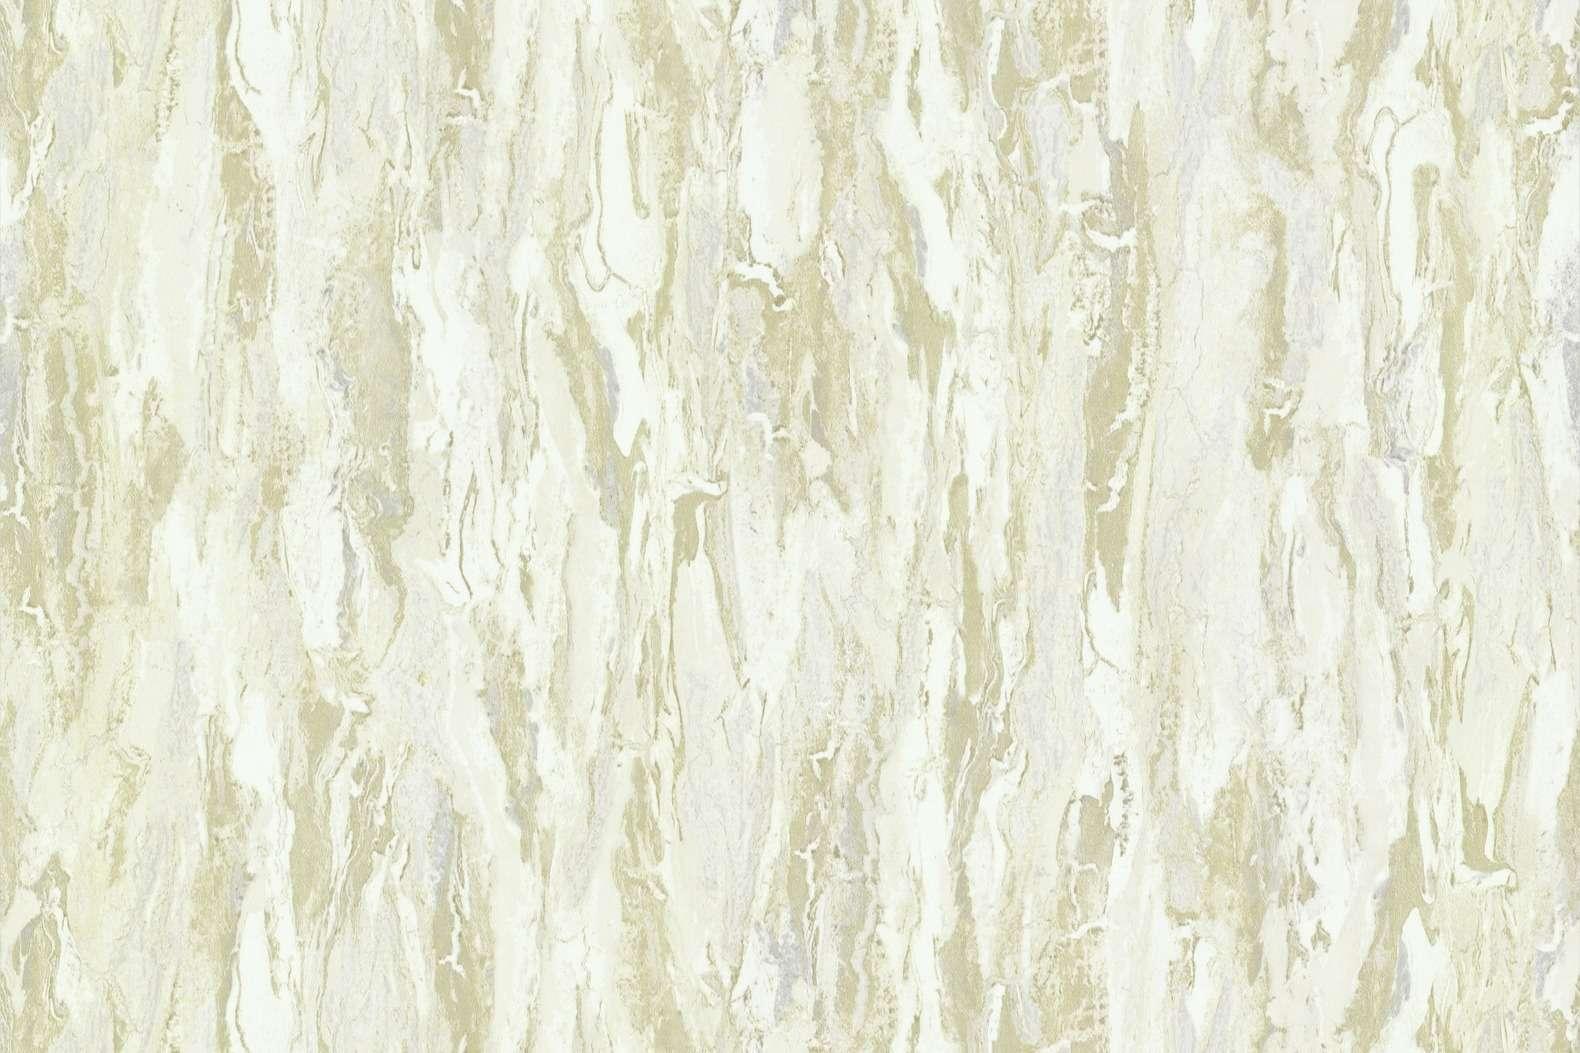 Обои Decori & Decori Carrara 2 — Декори Каррара 2 83690